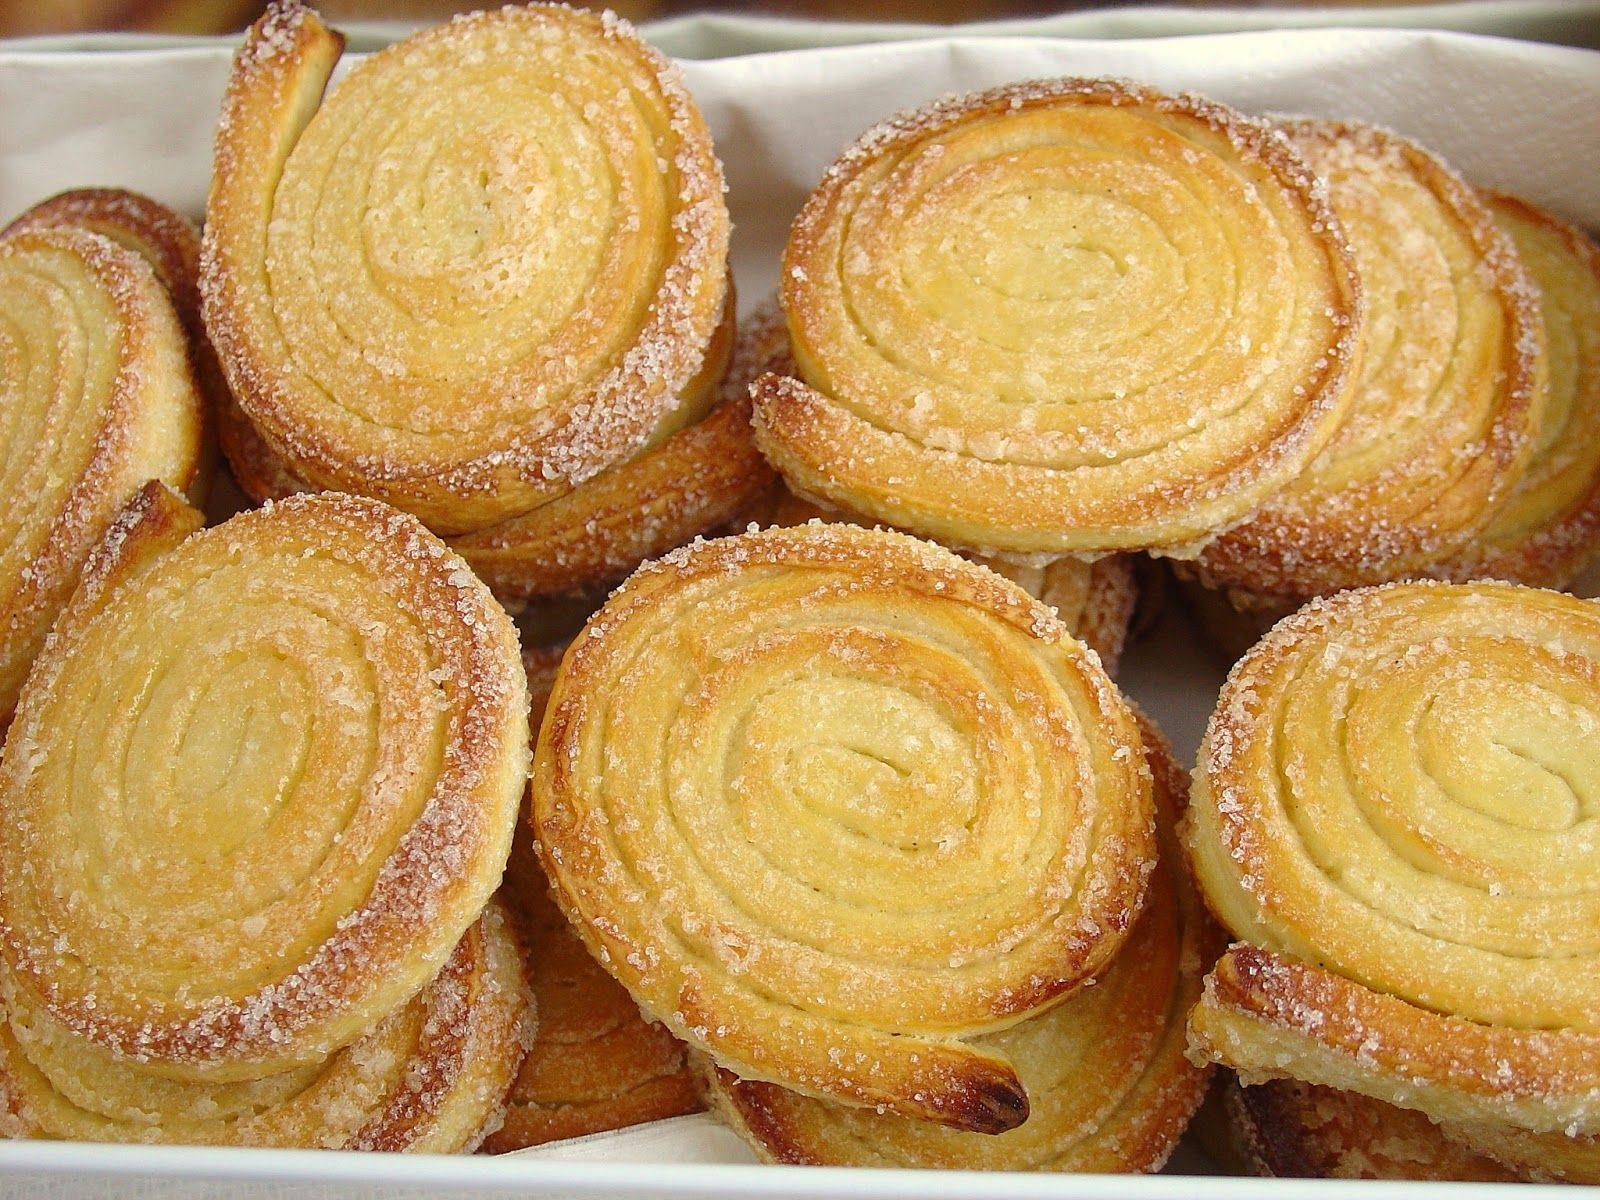 receta basica de galletas caseras